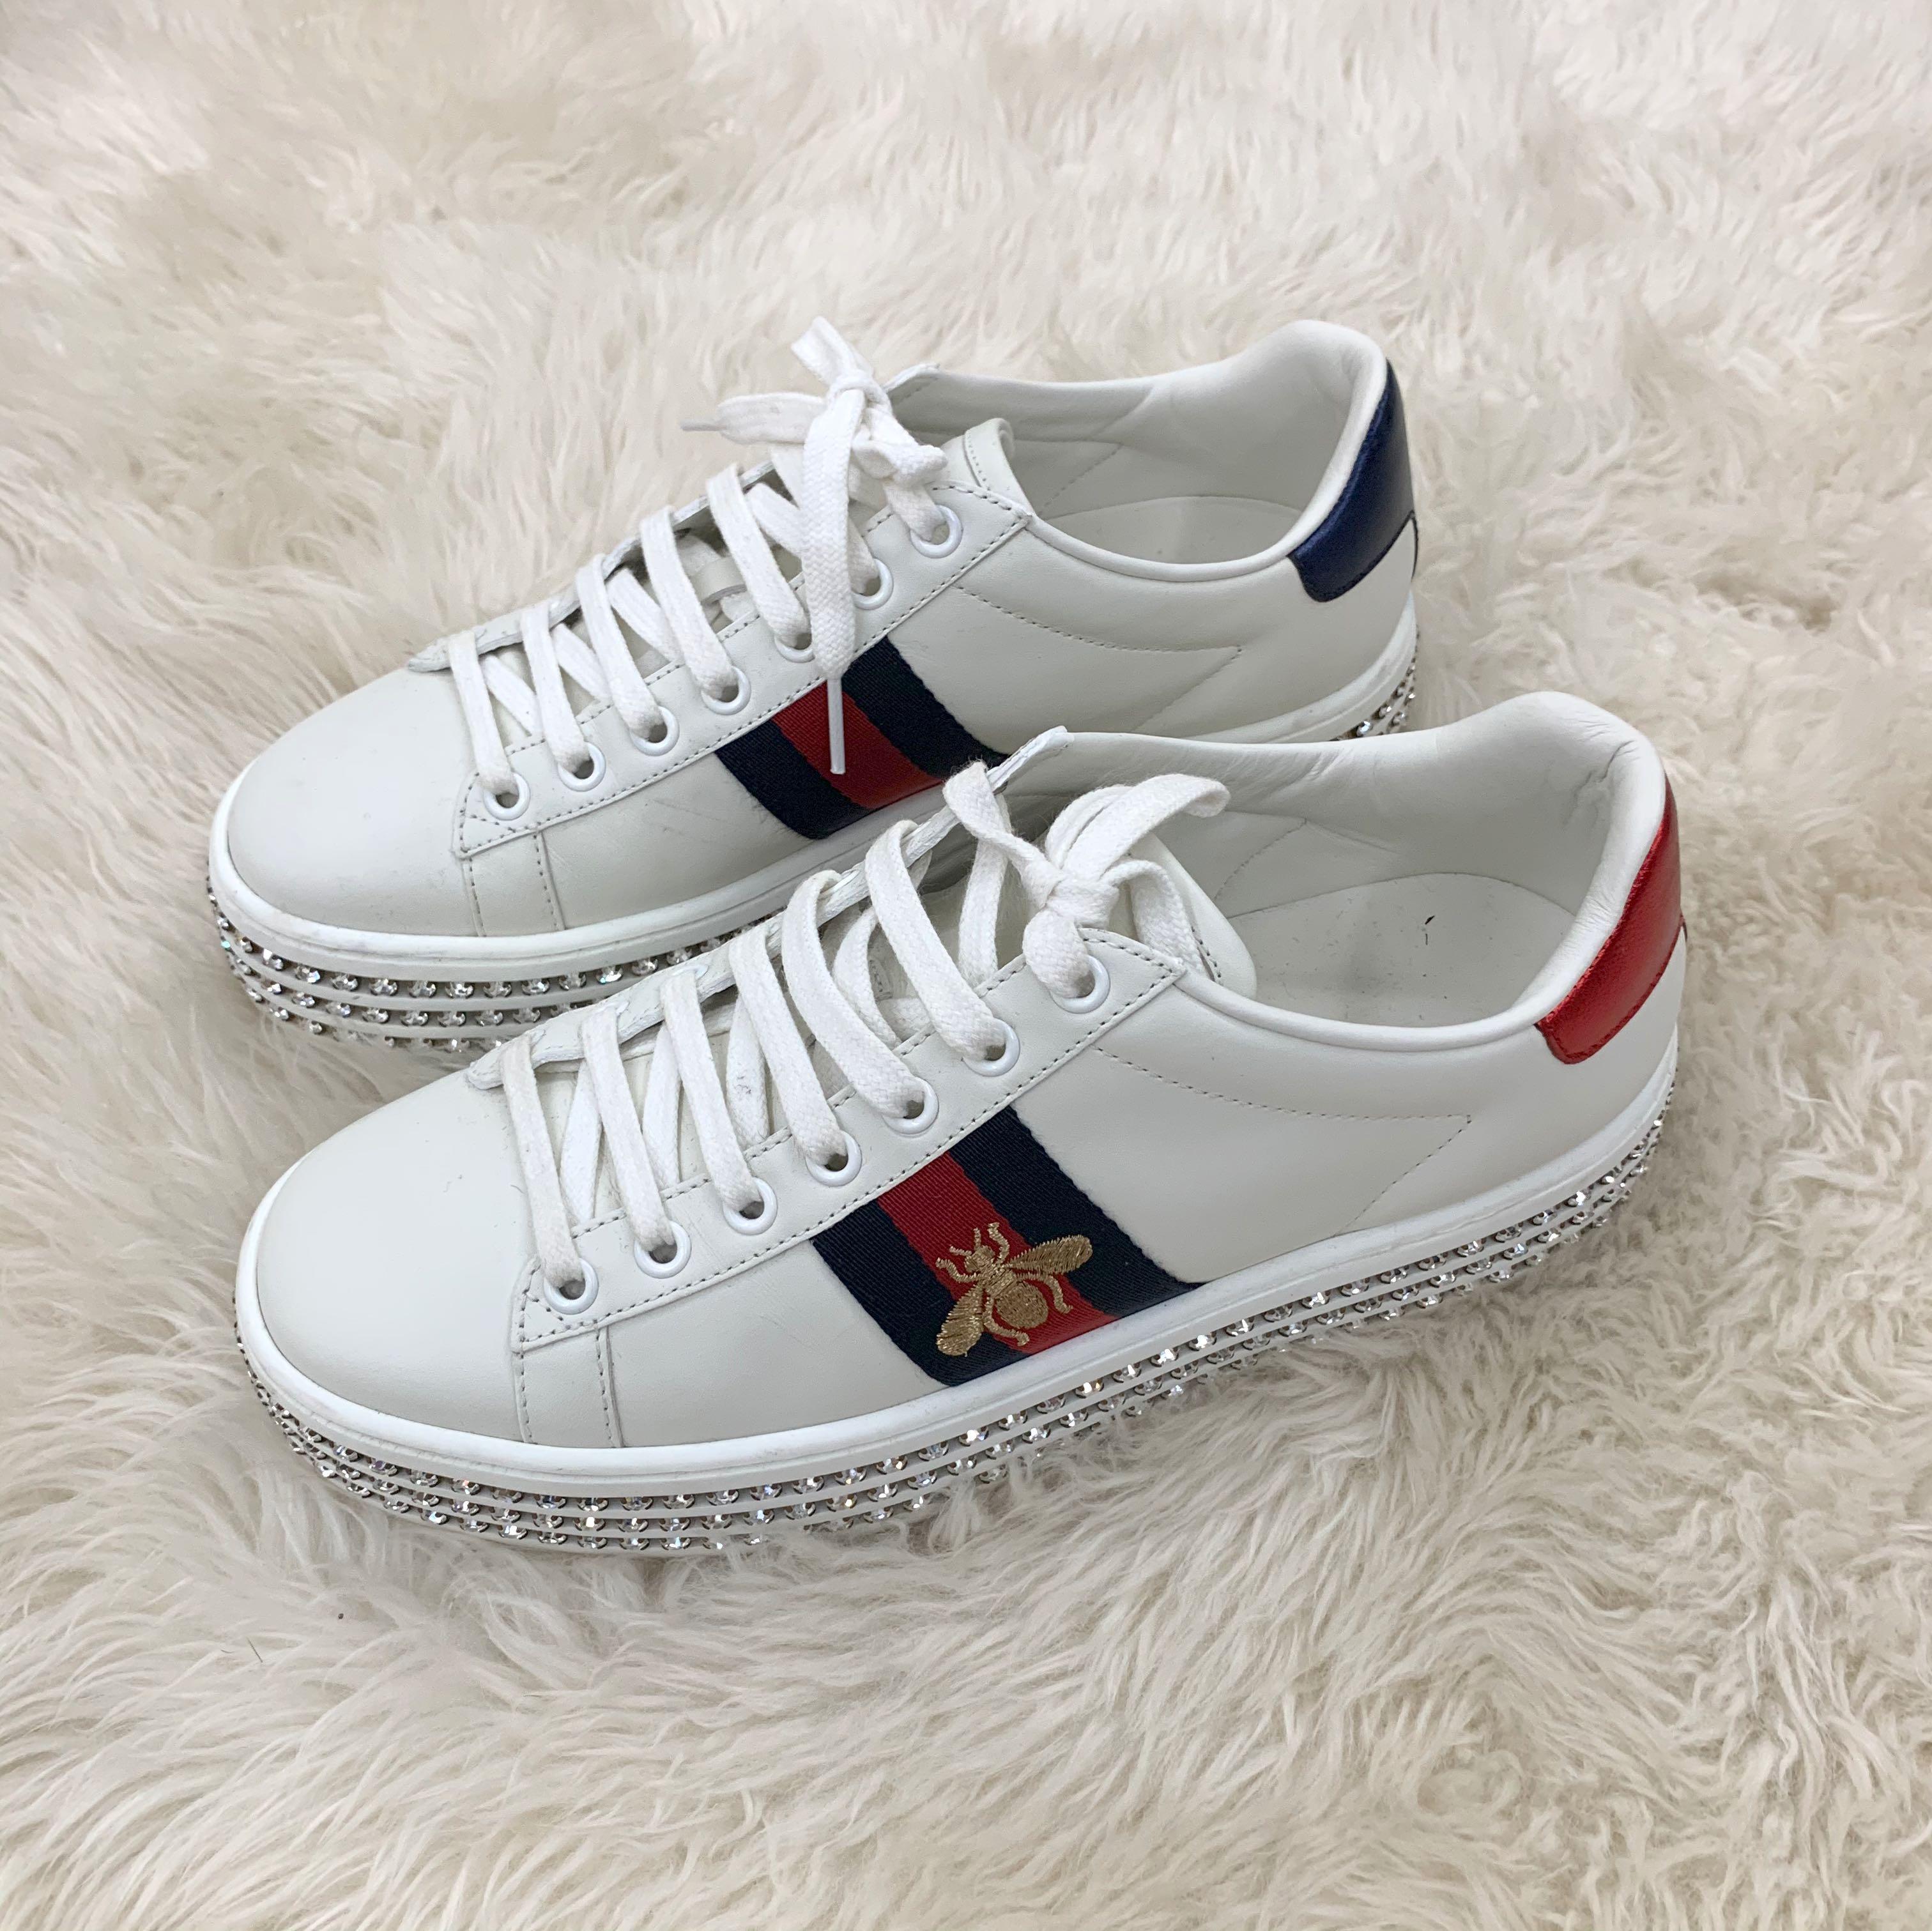 Gucci Sneaker Shoe Bee in White diamond